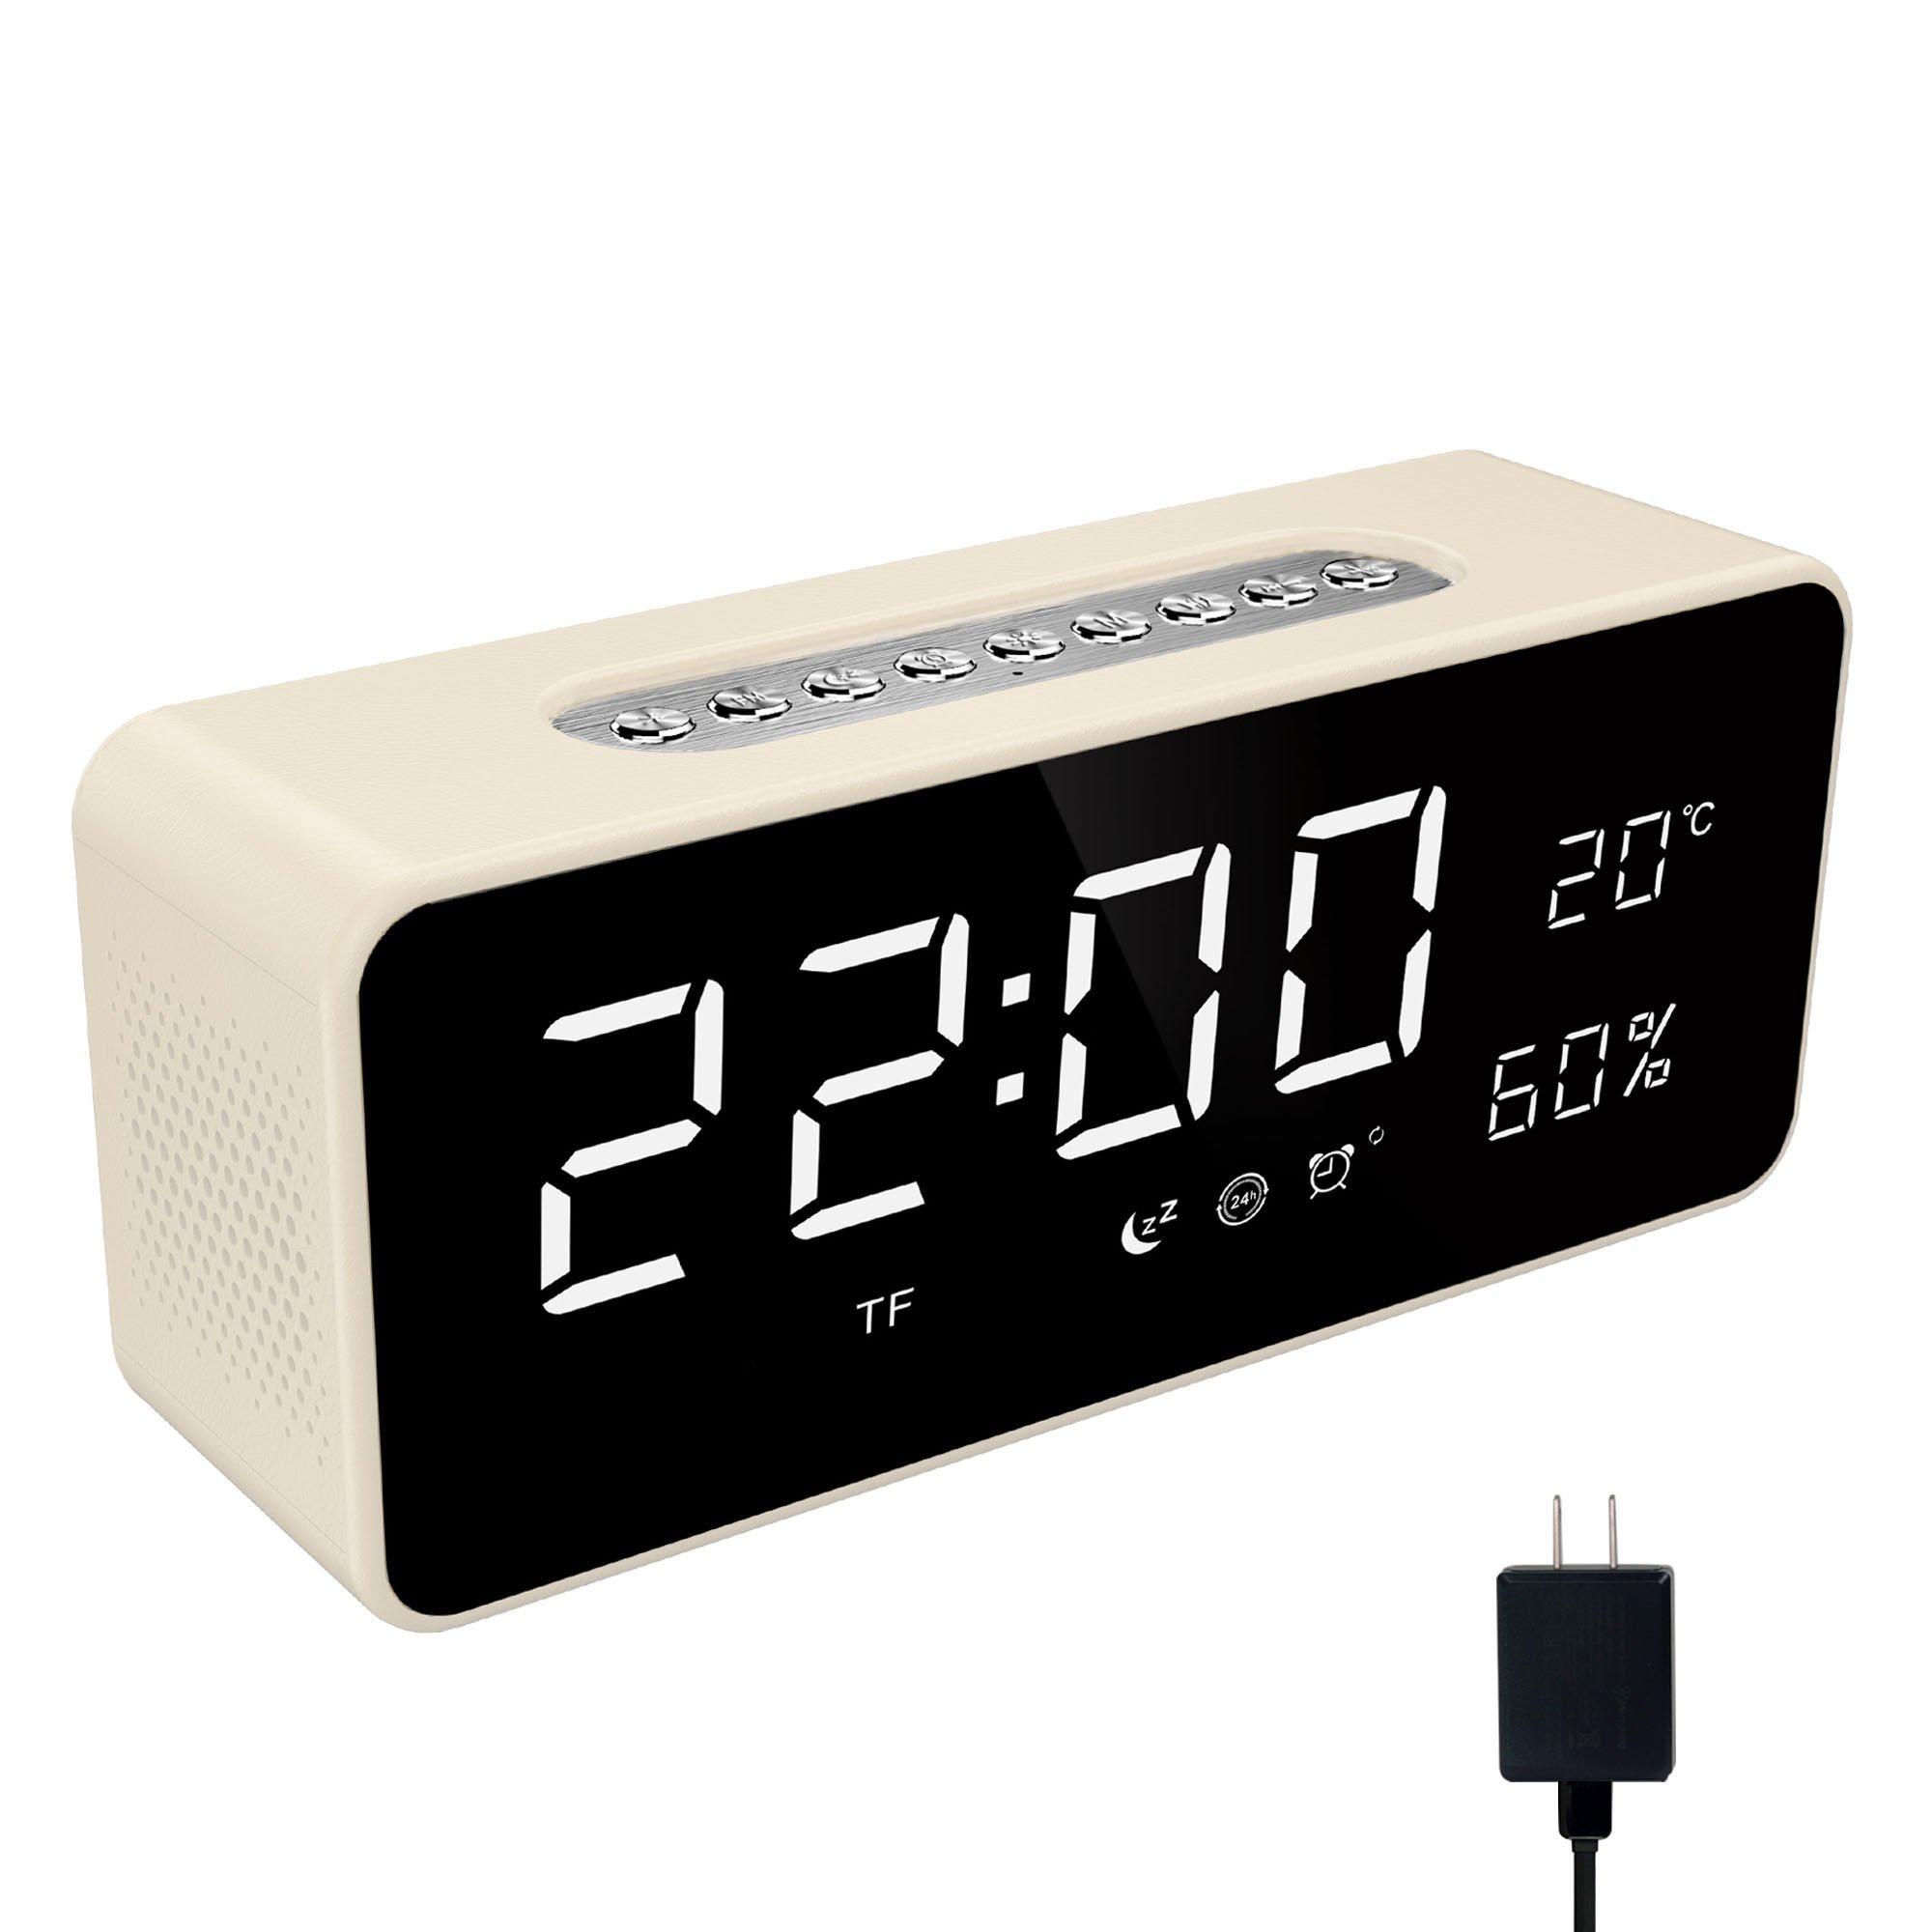 Soundance Alarm Clock Radio - with FM Radio, Wireless Speaker, Micro SD/TF Card USB Disk Player, Sleep Timer, Portable for Bedroom Bedside Office Desk Laptop Desktop Computer, S1 White